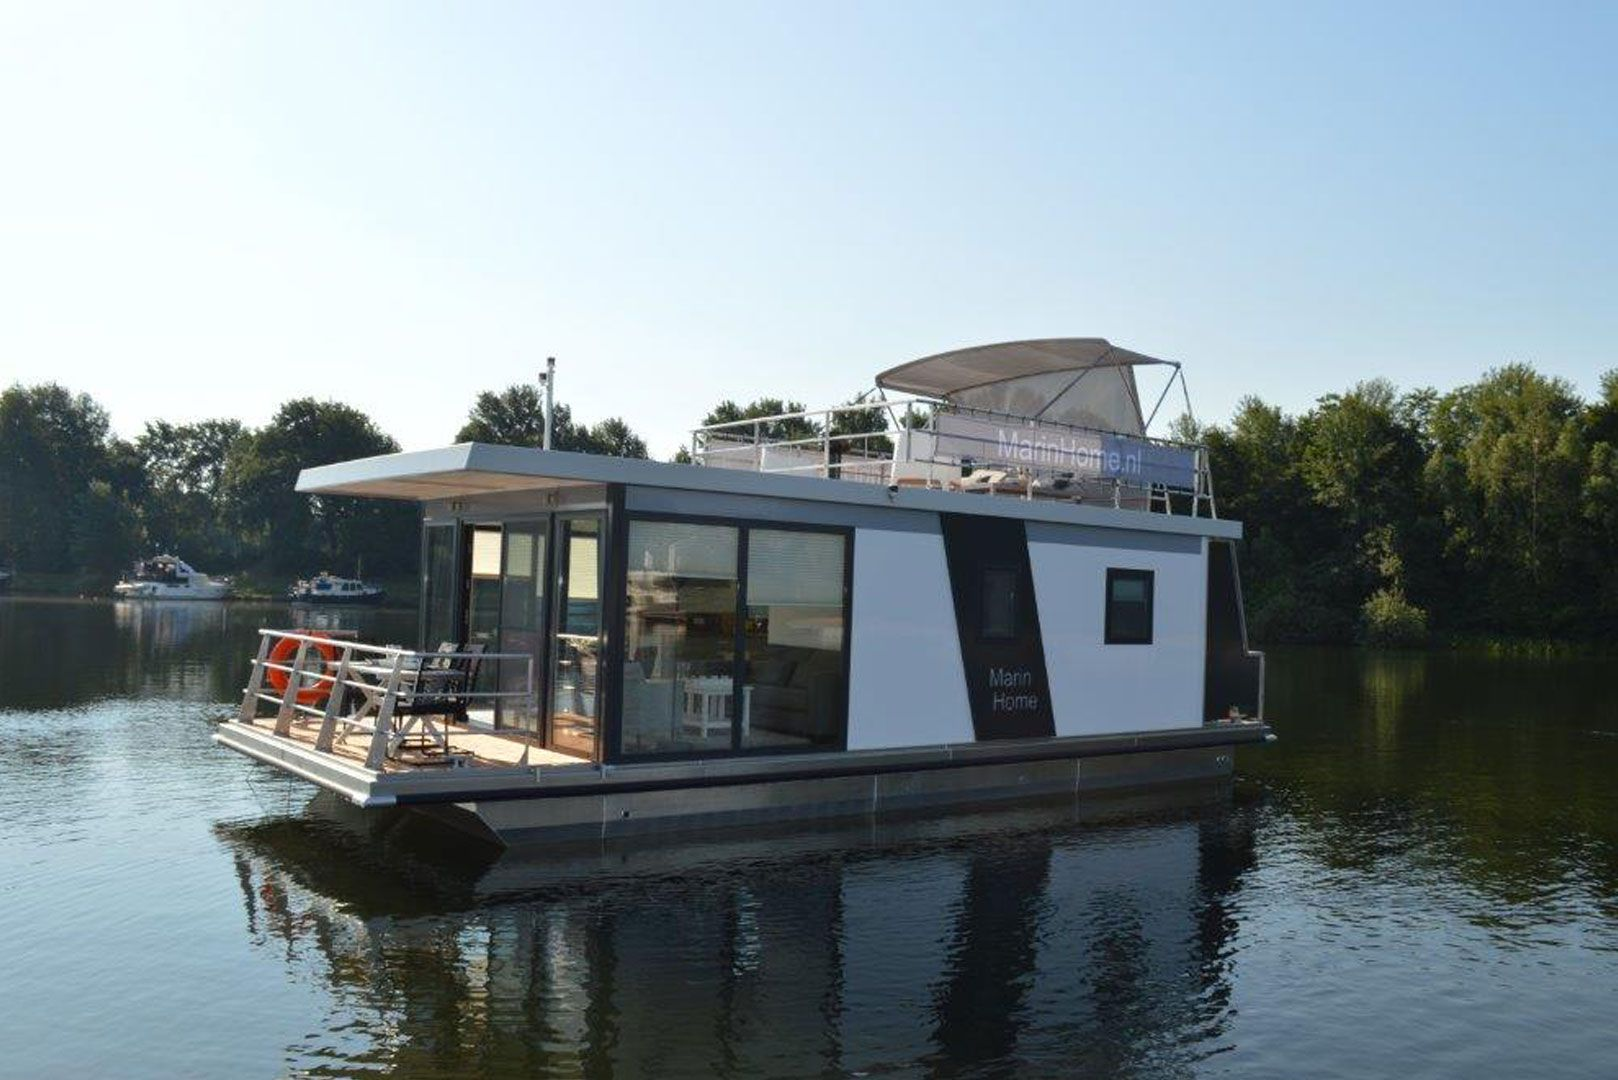 hausboot holland kaufen floating34 Hausboot, Hausboot kaufen